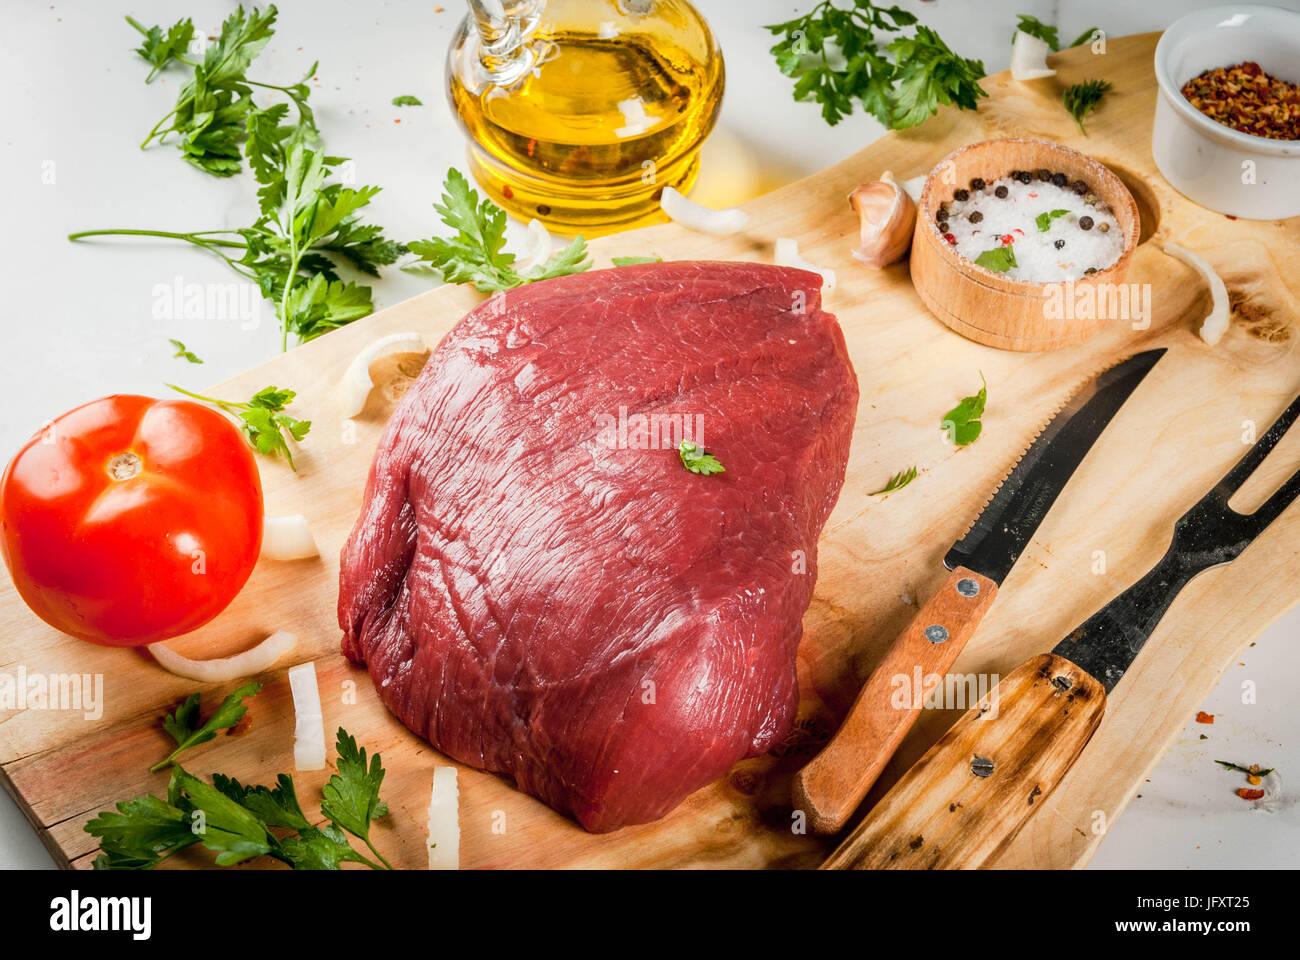 Fillet im genes de stock fillet fotos de stock alamy for Cocinar filetes de ternera